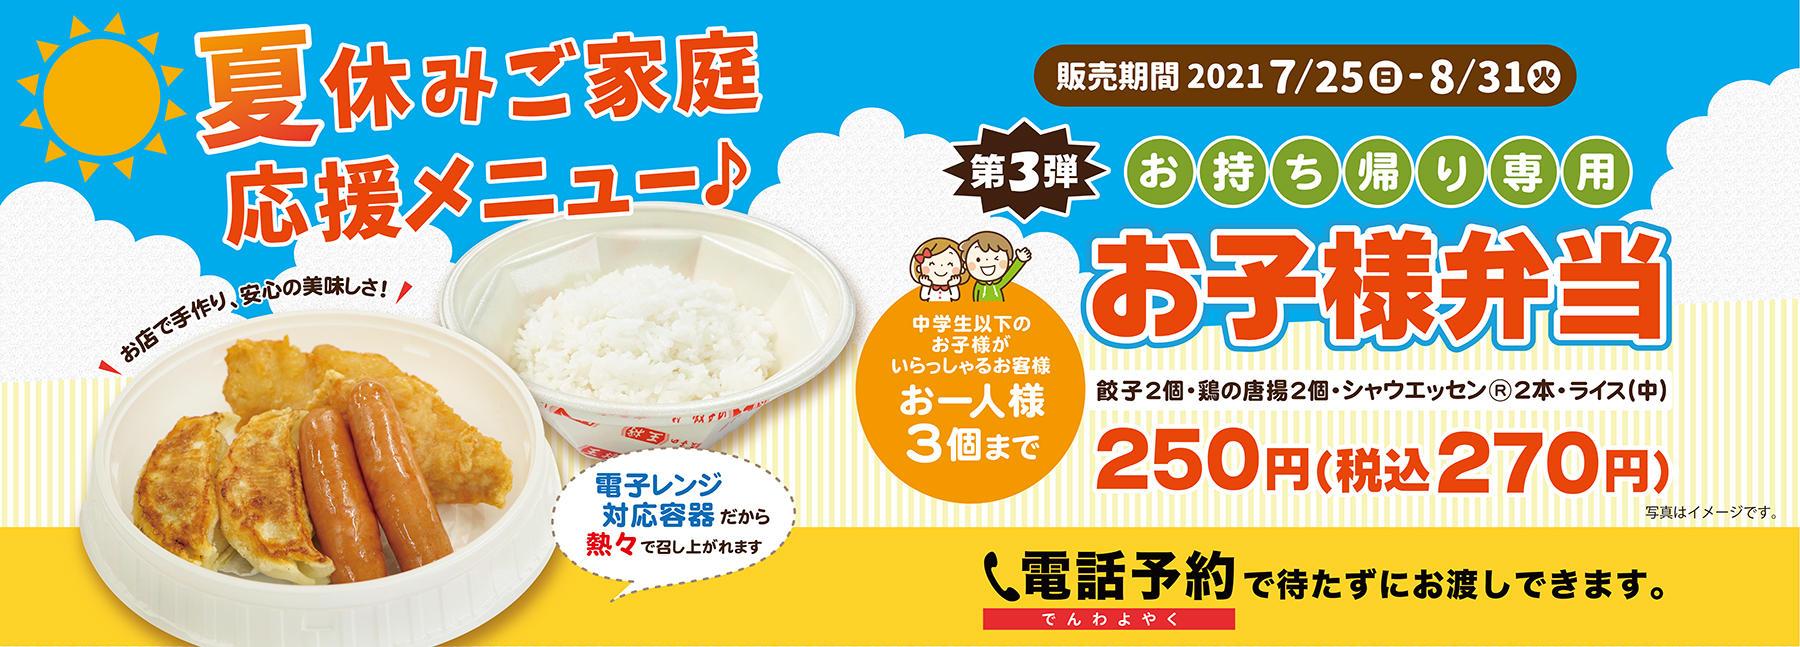 okosama21_07info.jpg